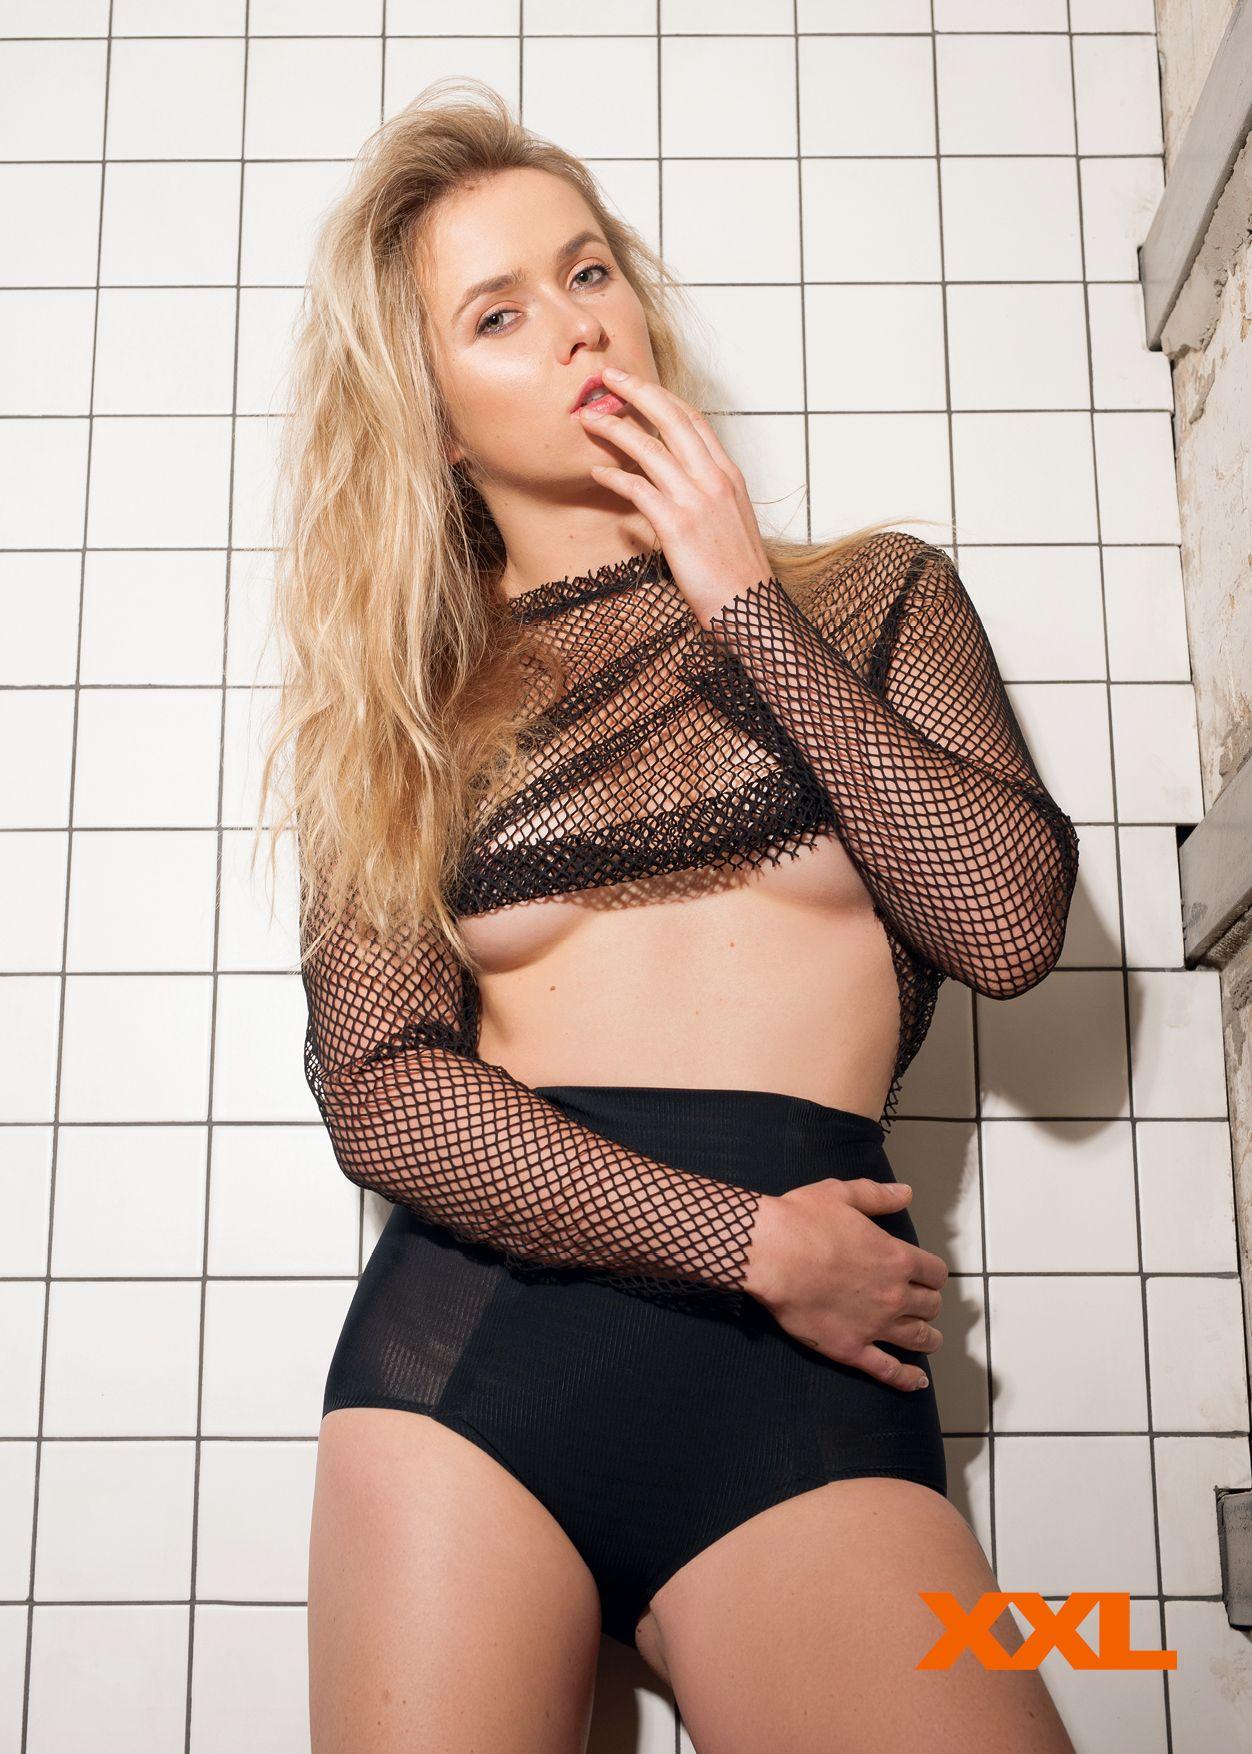 Elina-Svitolina-Sexy-Topless-1-thefappeningblog.com_.jpg